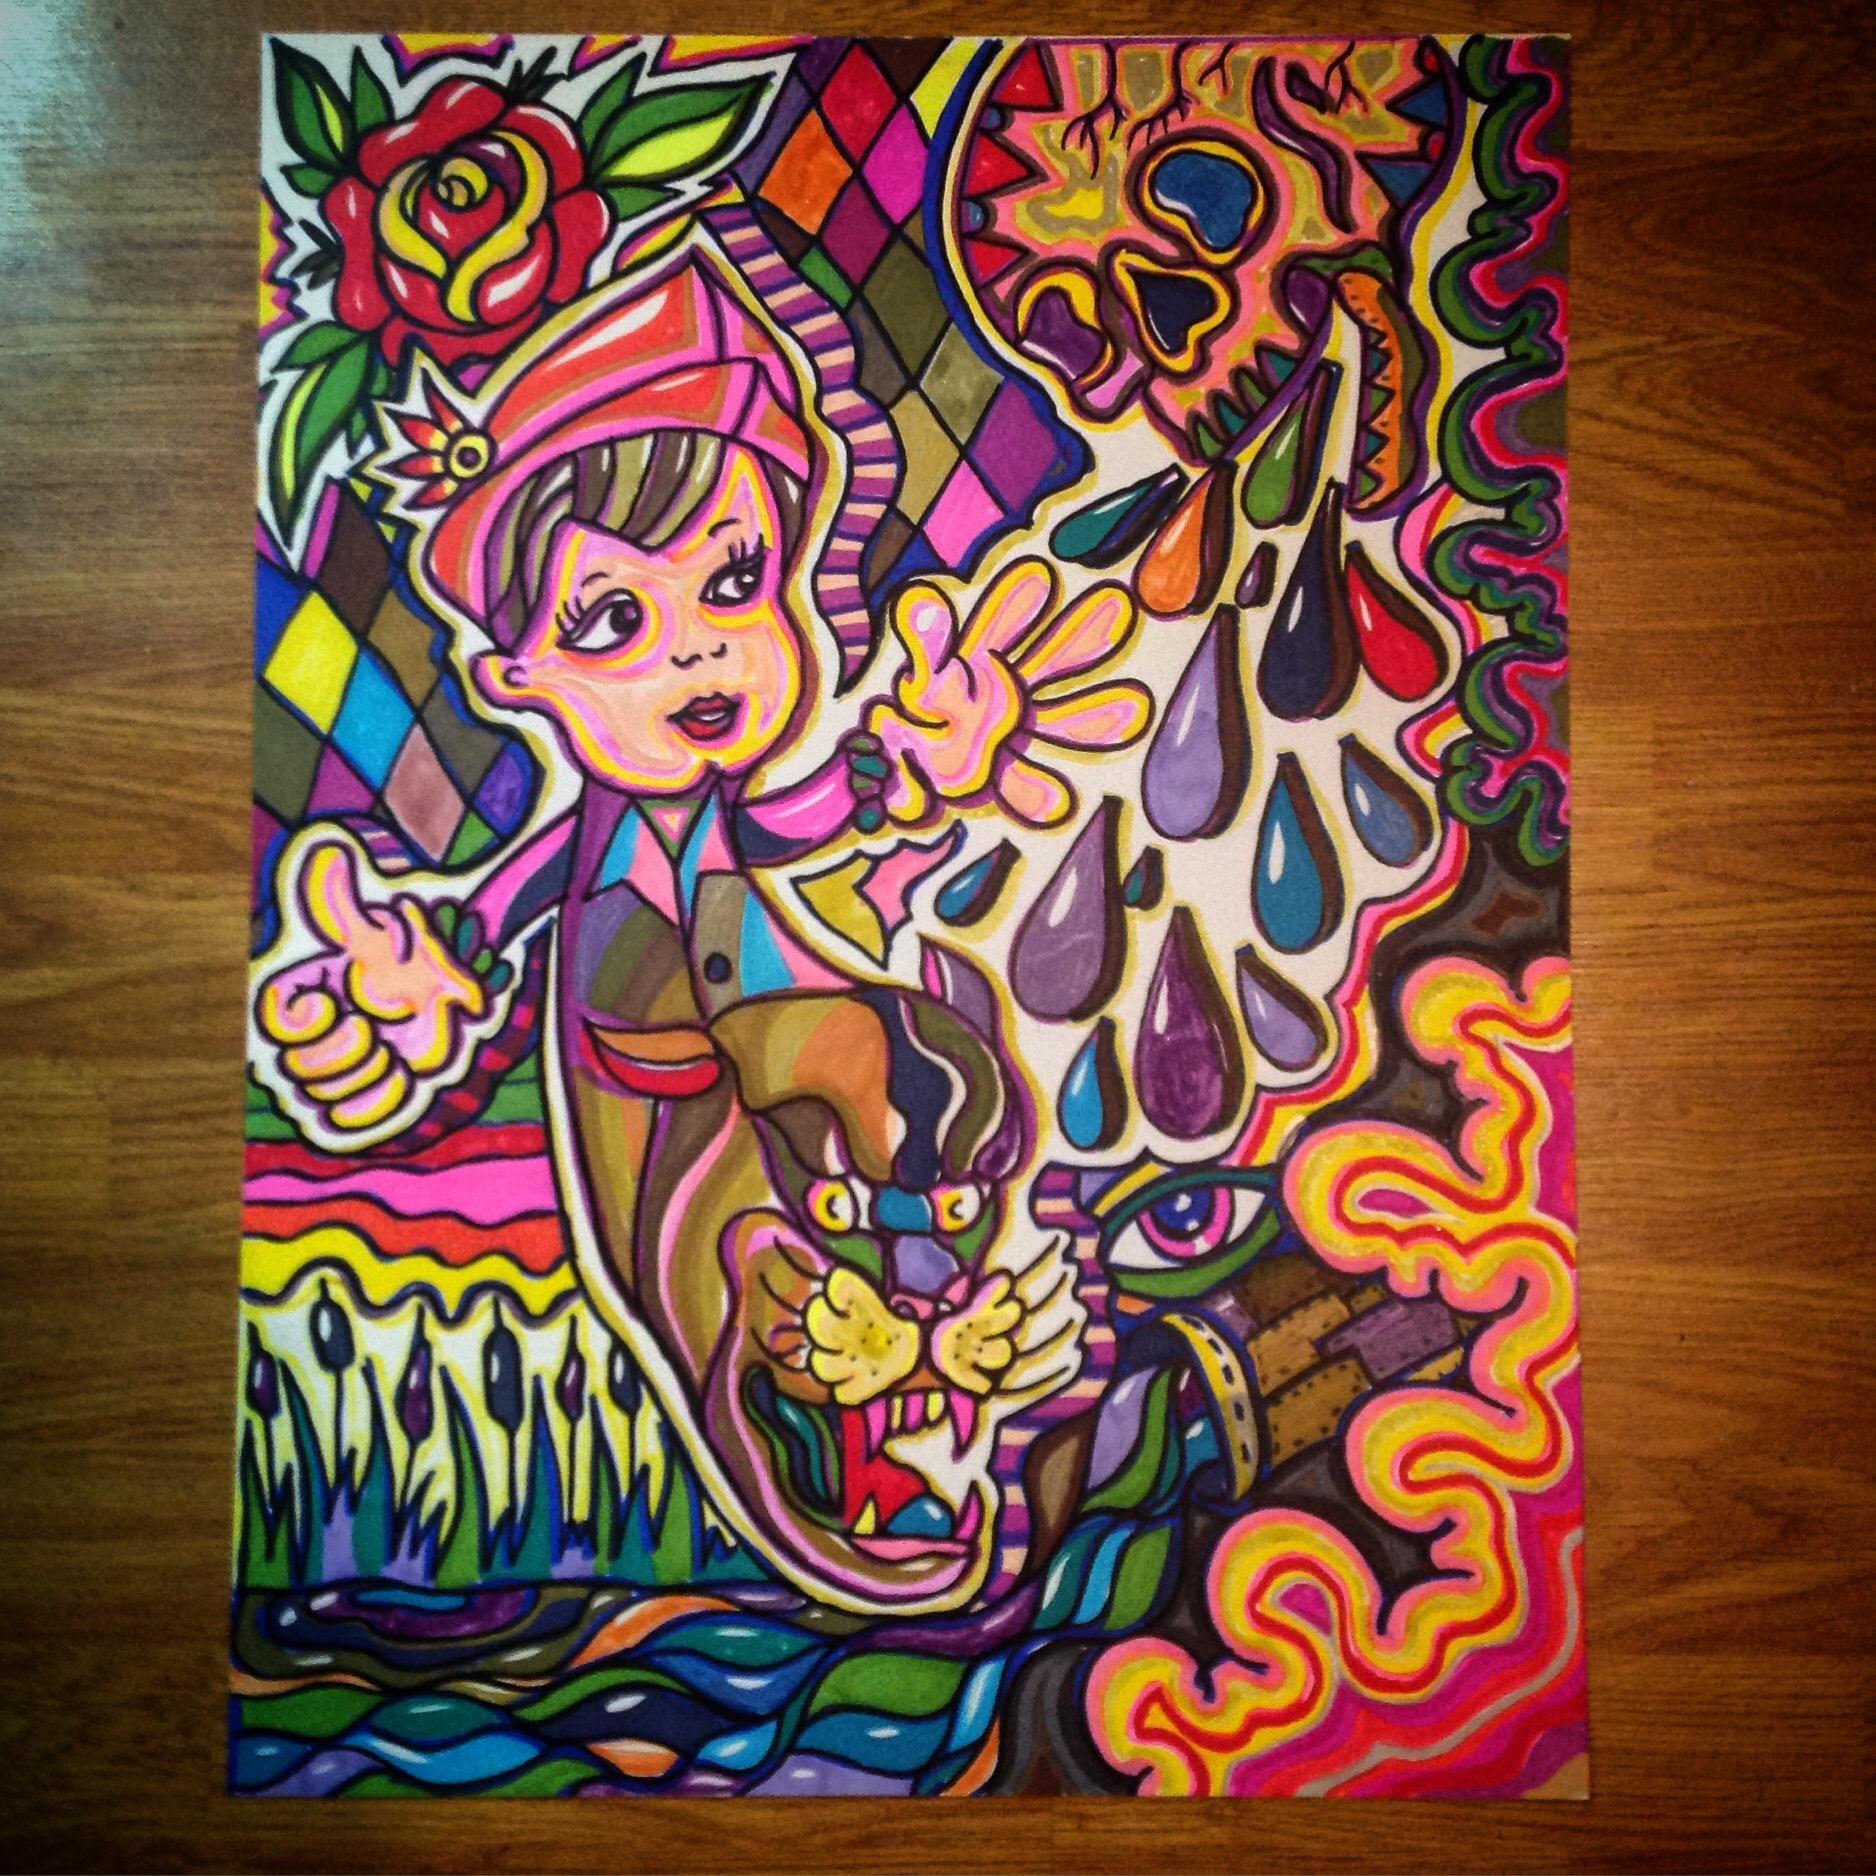 Paint Marker Artwork